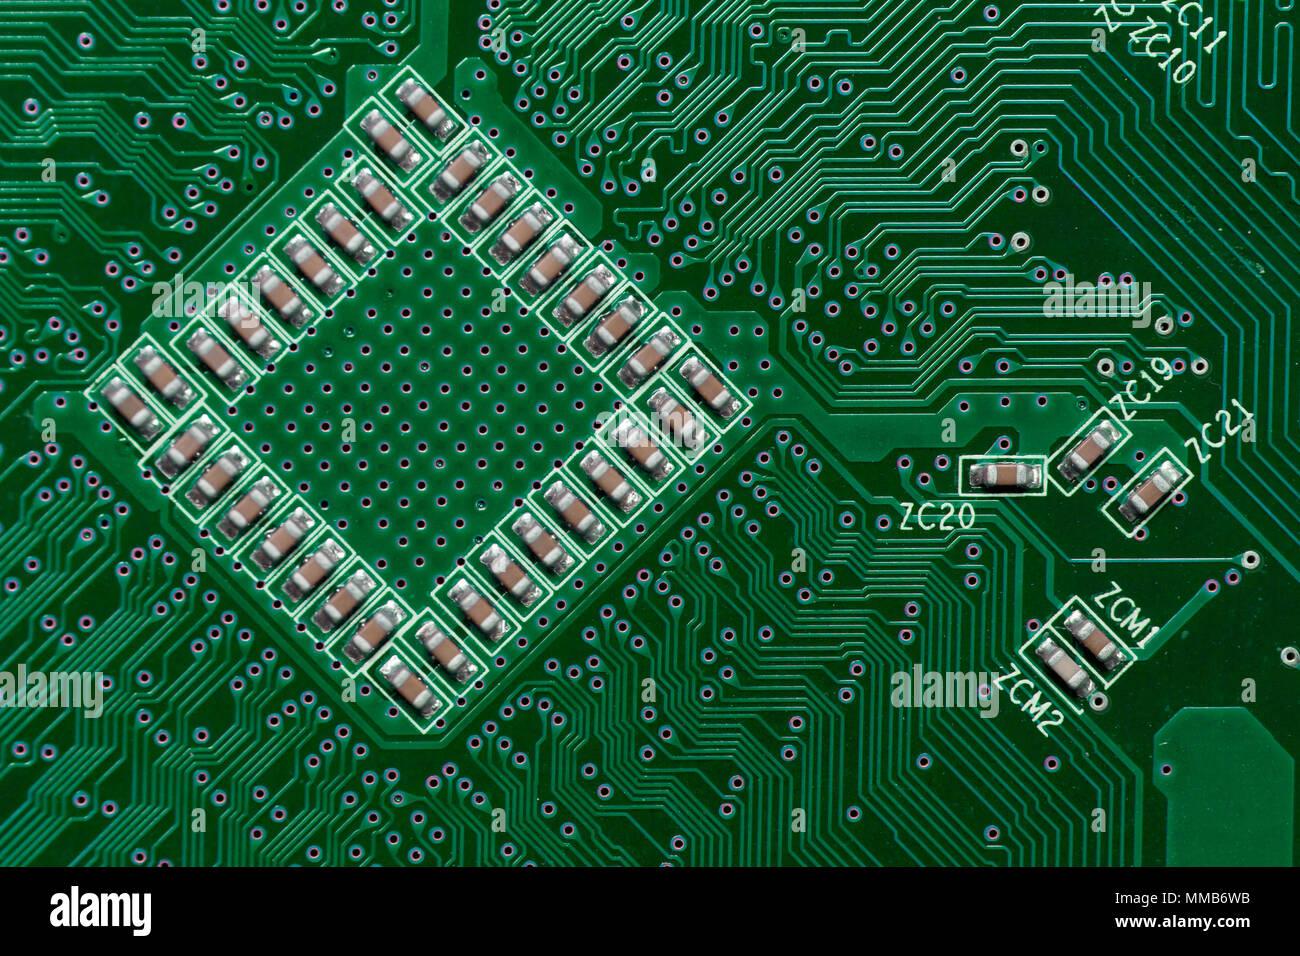 Ceramic Capacitors on Green Digital electronic circuit board texture ...